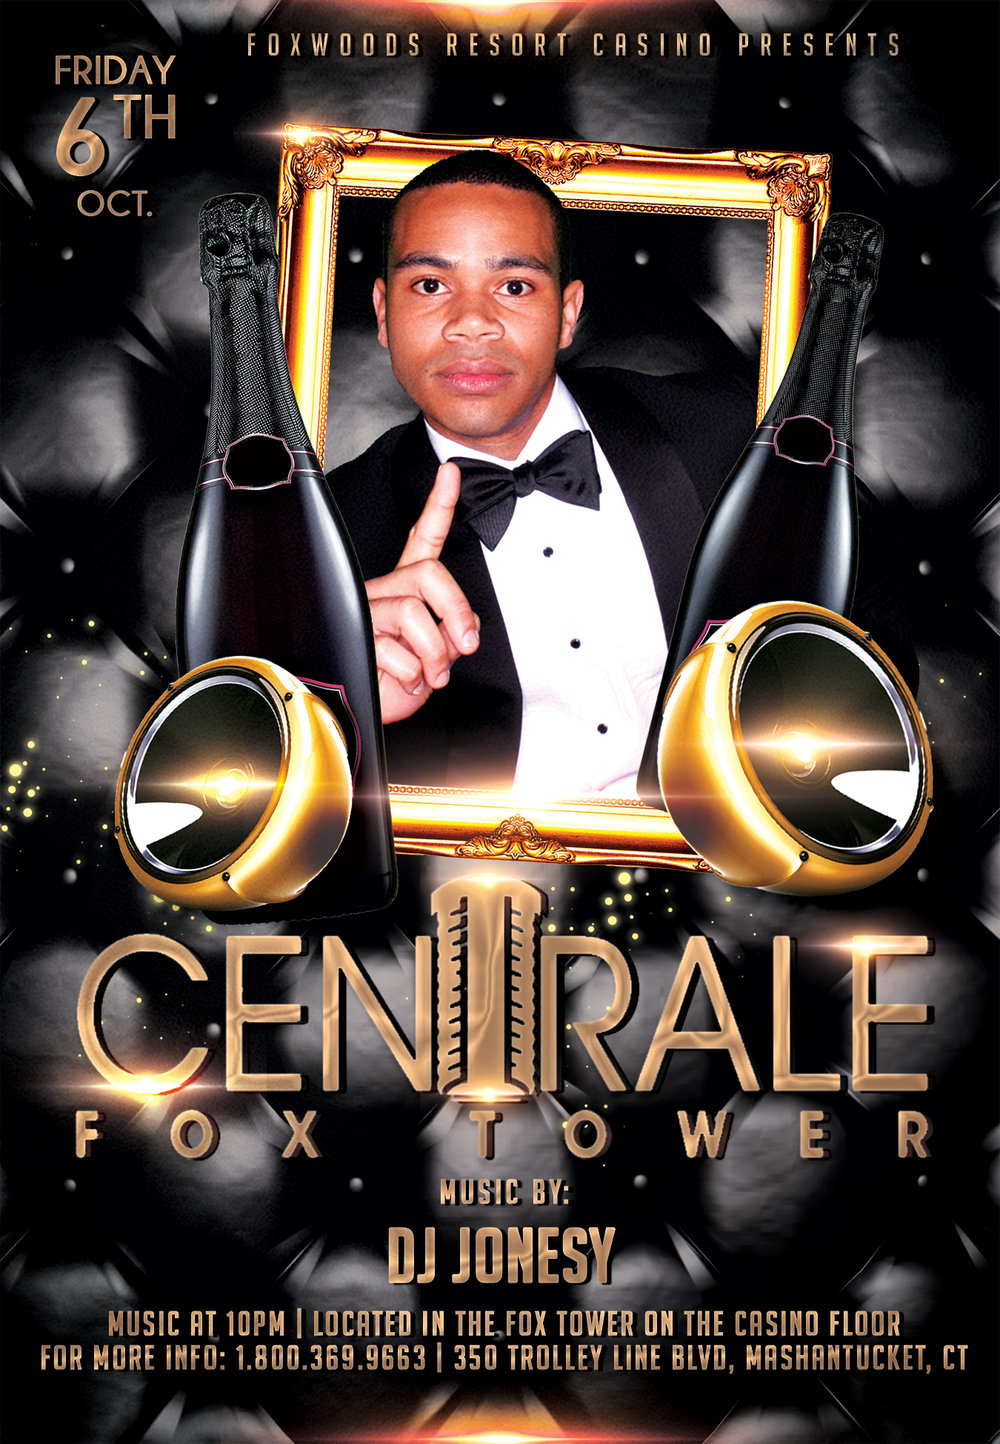 JONESY-CENTRALE-FOX_TOWER_ROUND2-noROSE-oct6-17.jpg